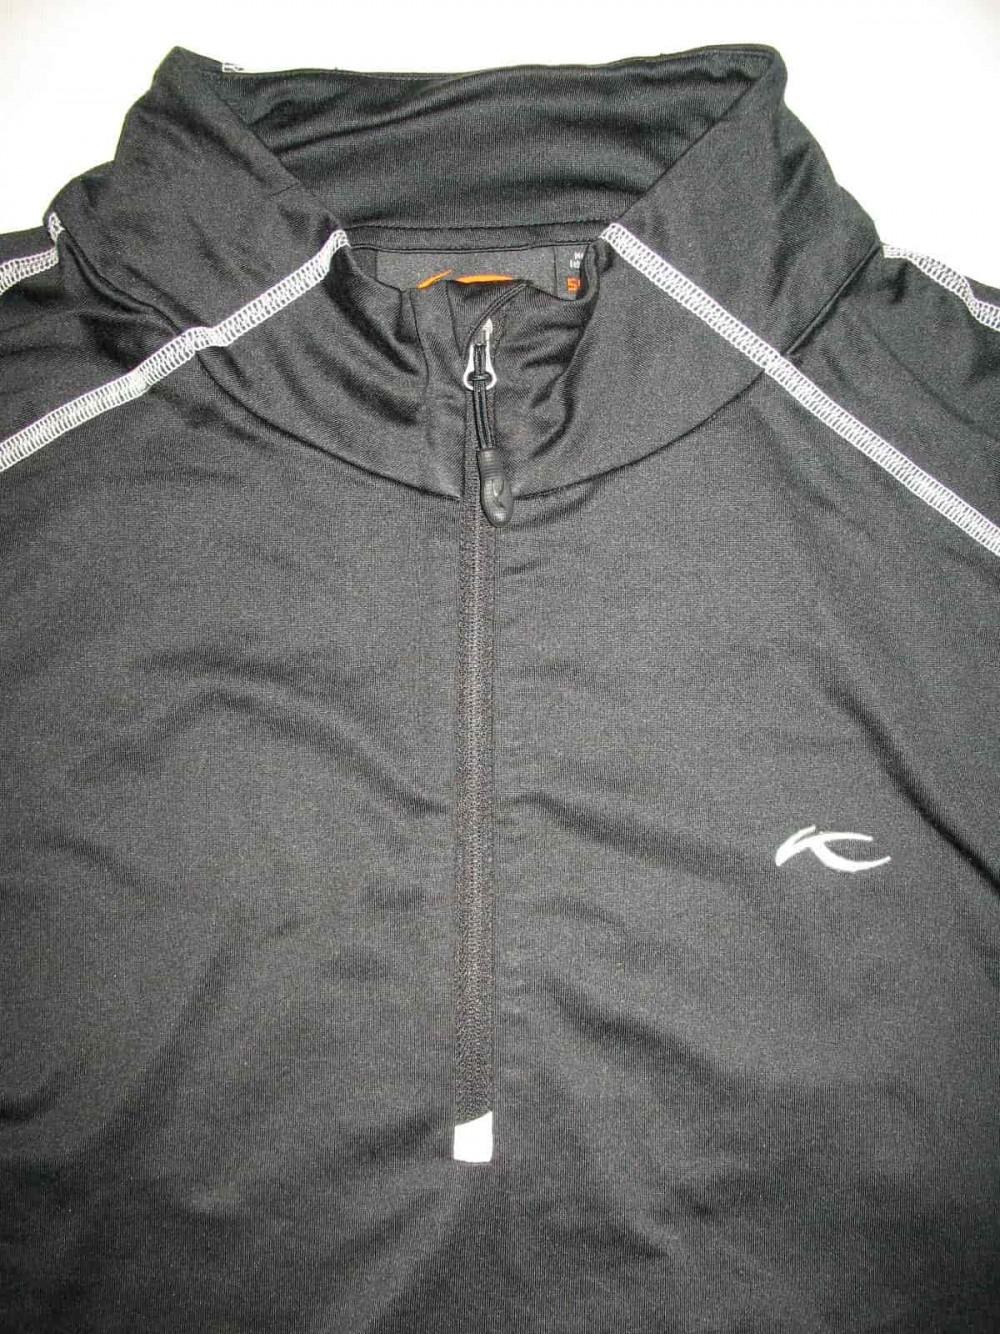 Кофта KJUS fleece midlayer jersey (размер 56-XXL) - 2